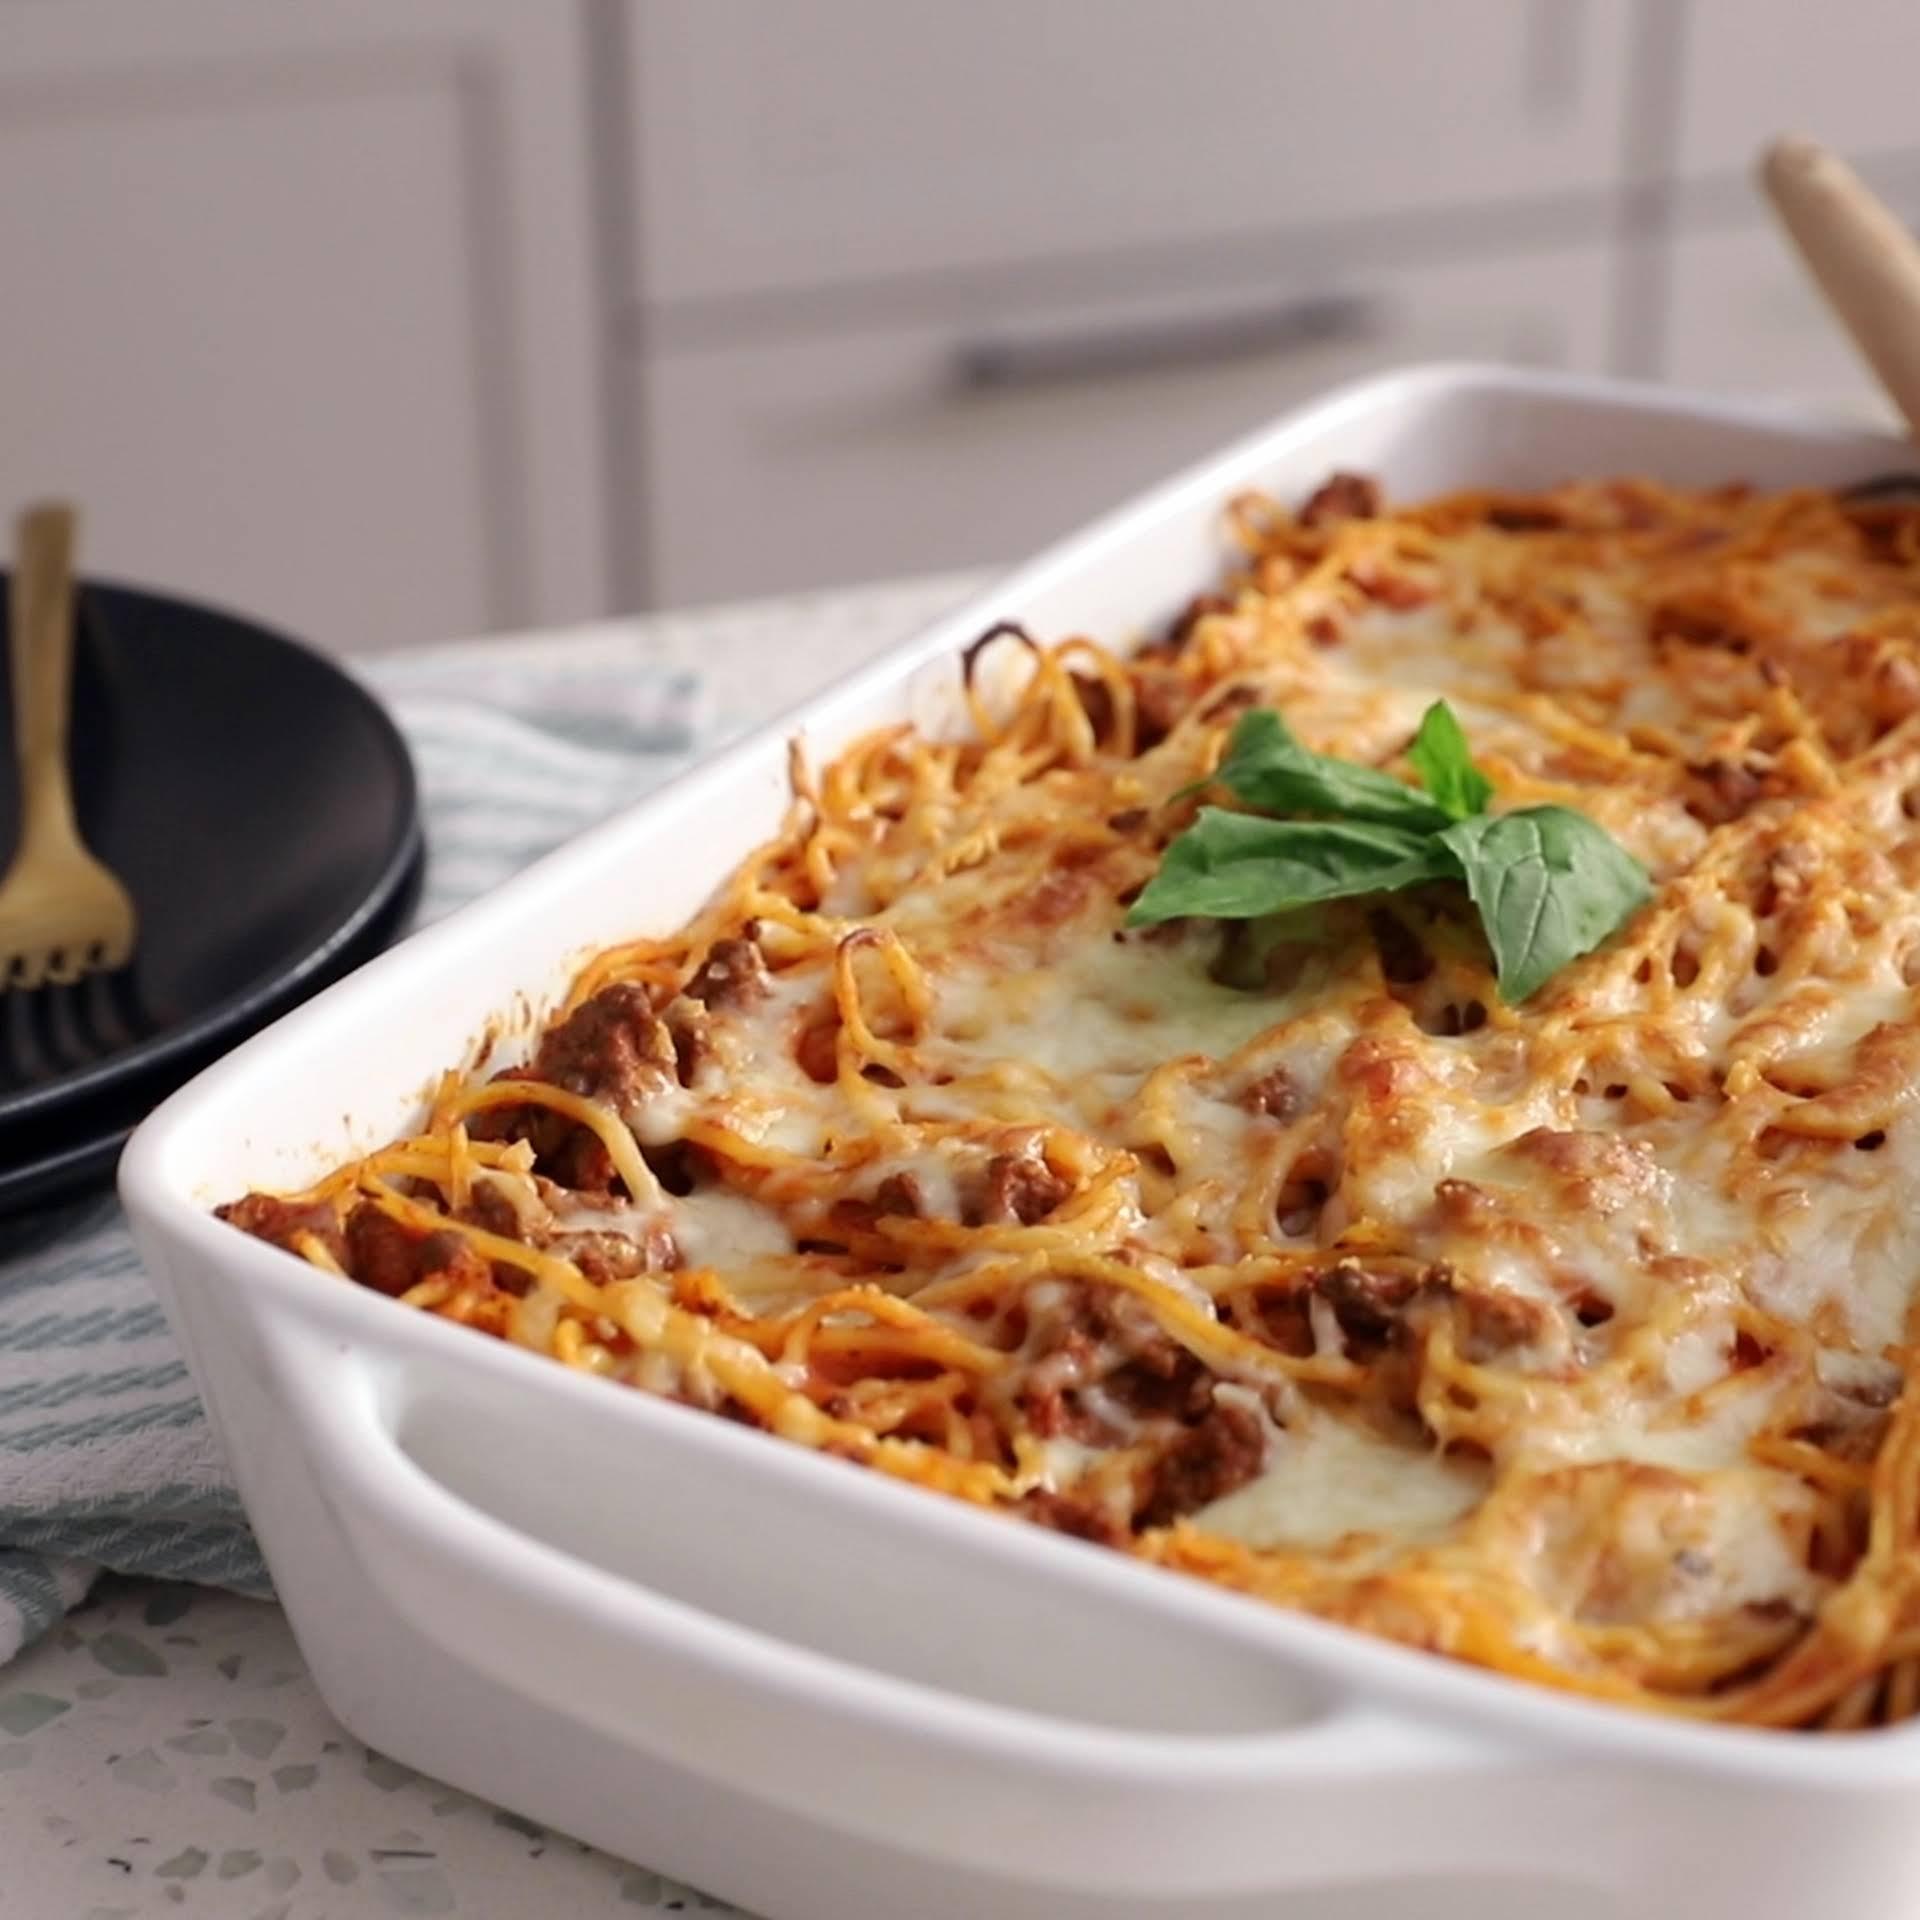 Easy Gluten-Free Baked Spaghetti